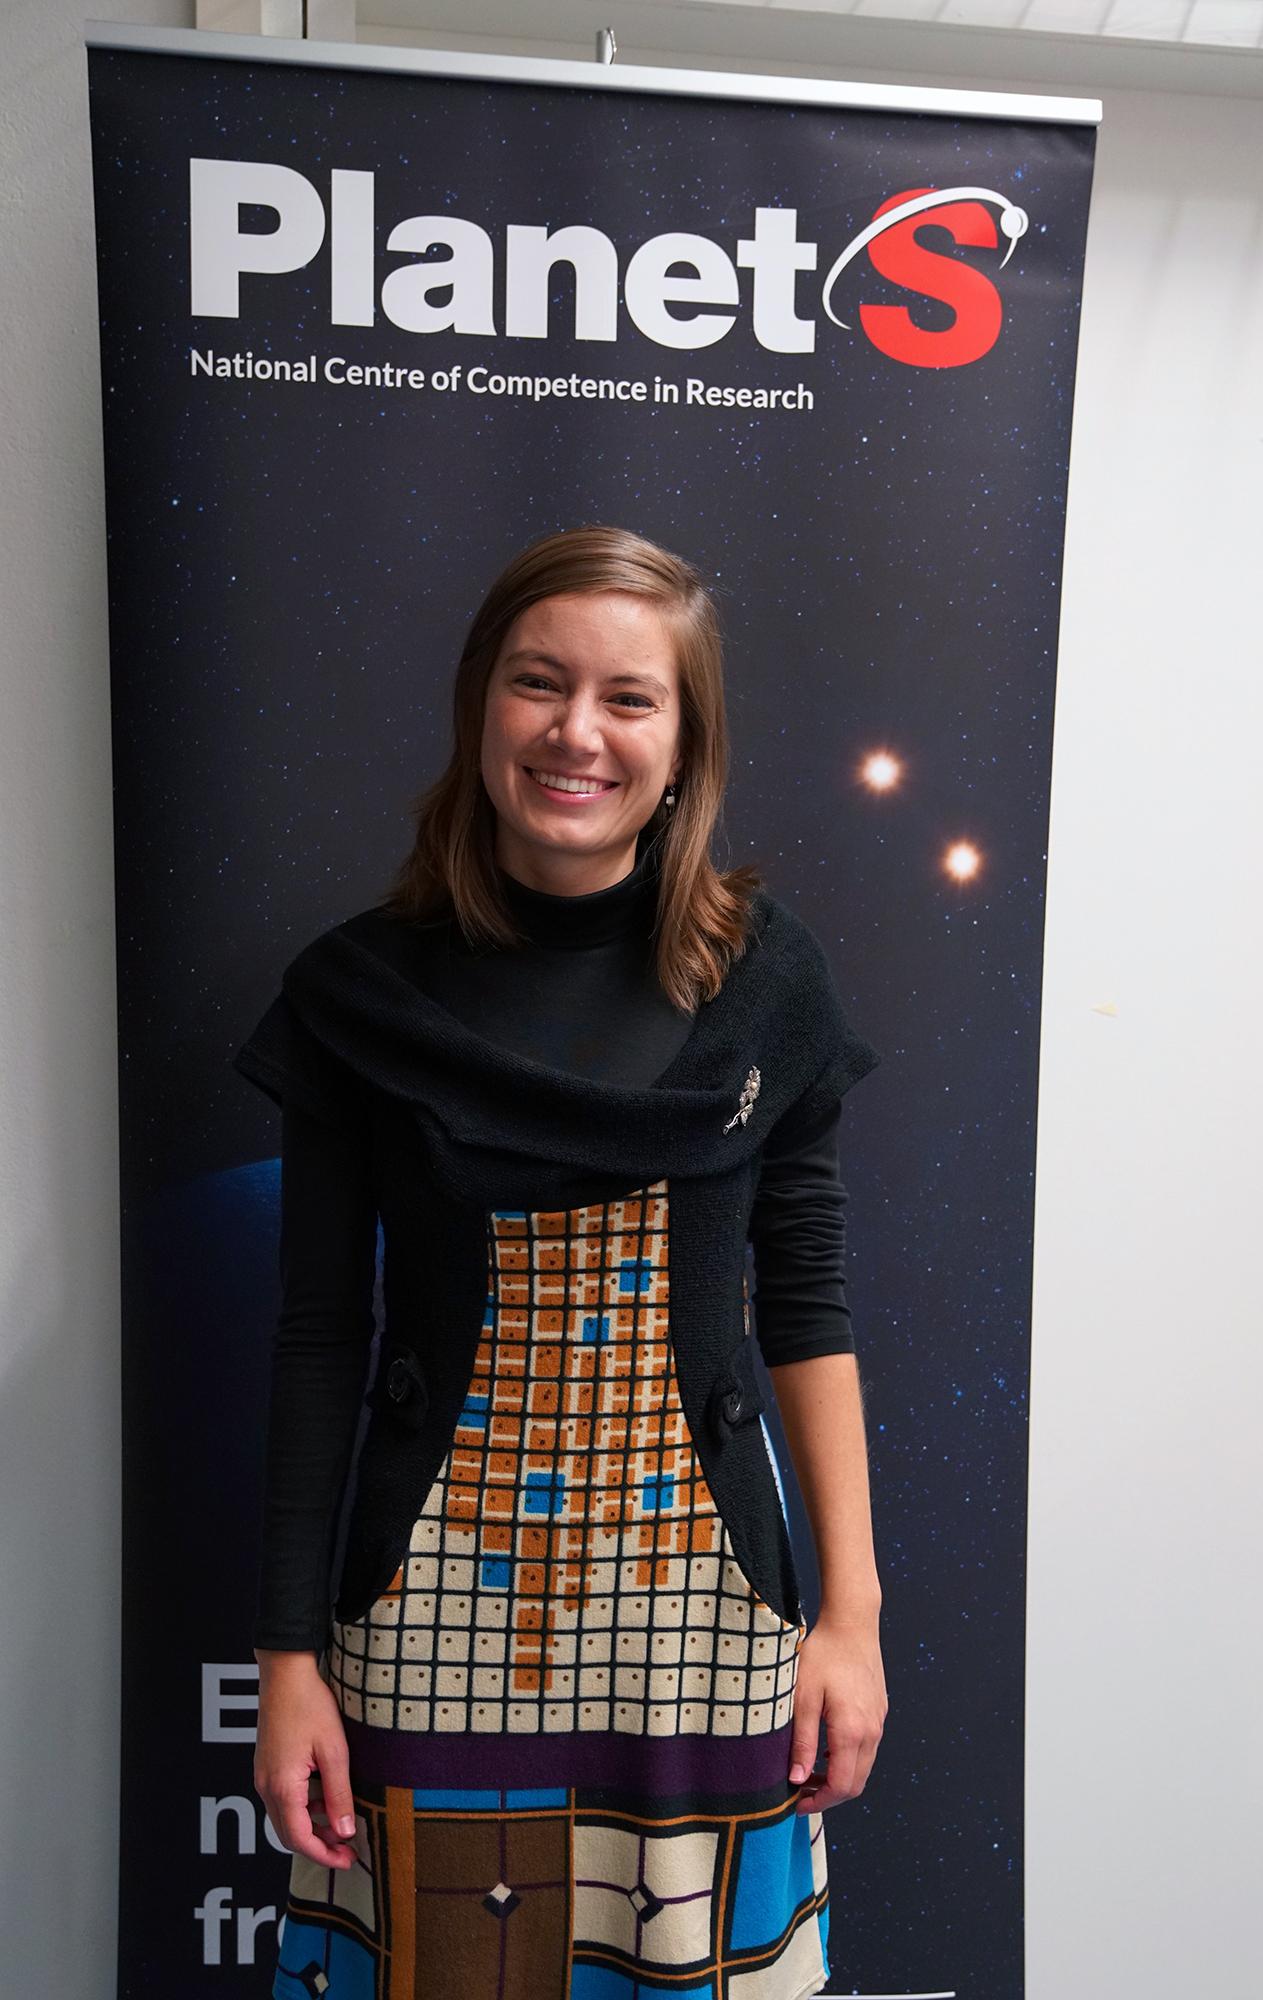 Dr. Julia Venturini, NFS PlanetS. © NFS PlanetS